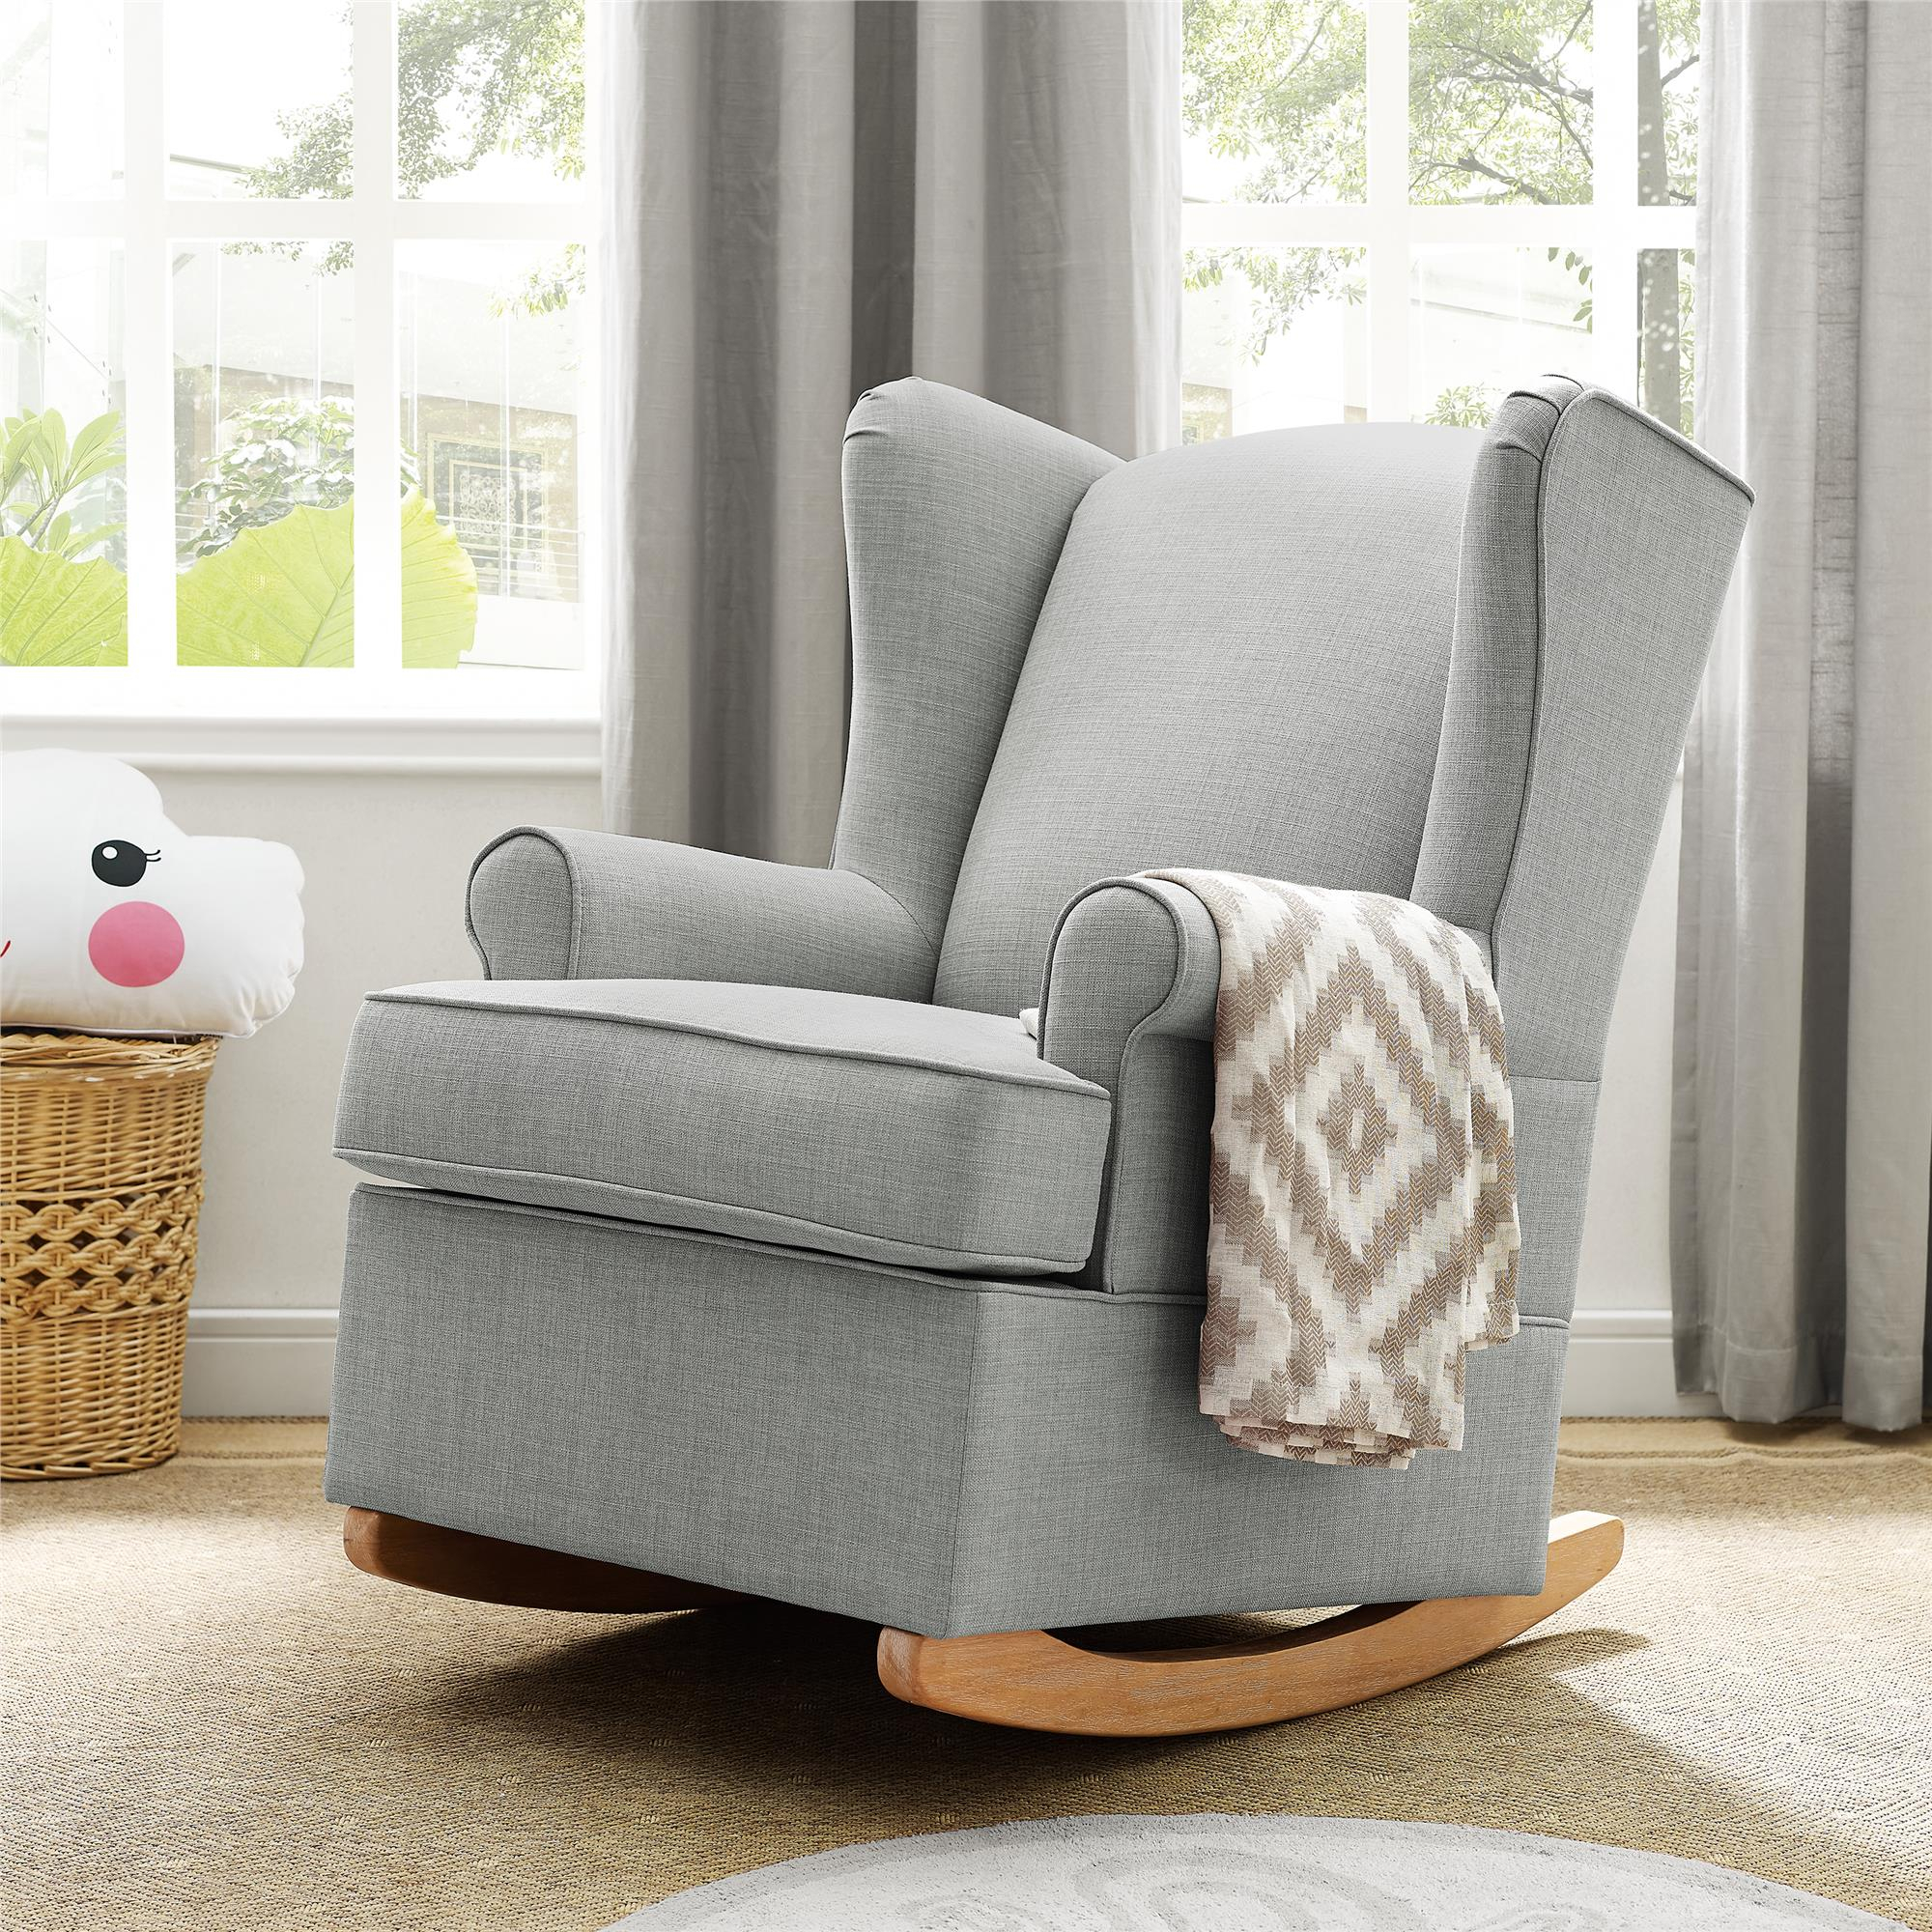 Dorel Living   Baby Relax Brennan Wingback Convertible Rocker, Gray In Brennan Sofa Chairs (Image 11 of 25)